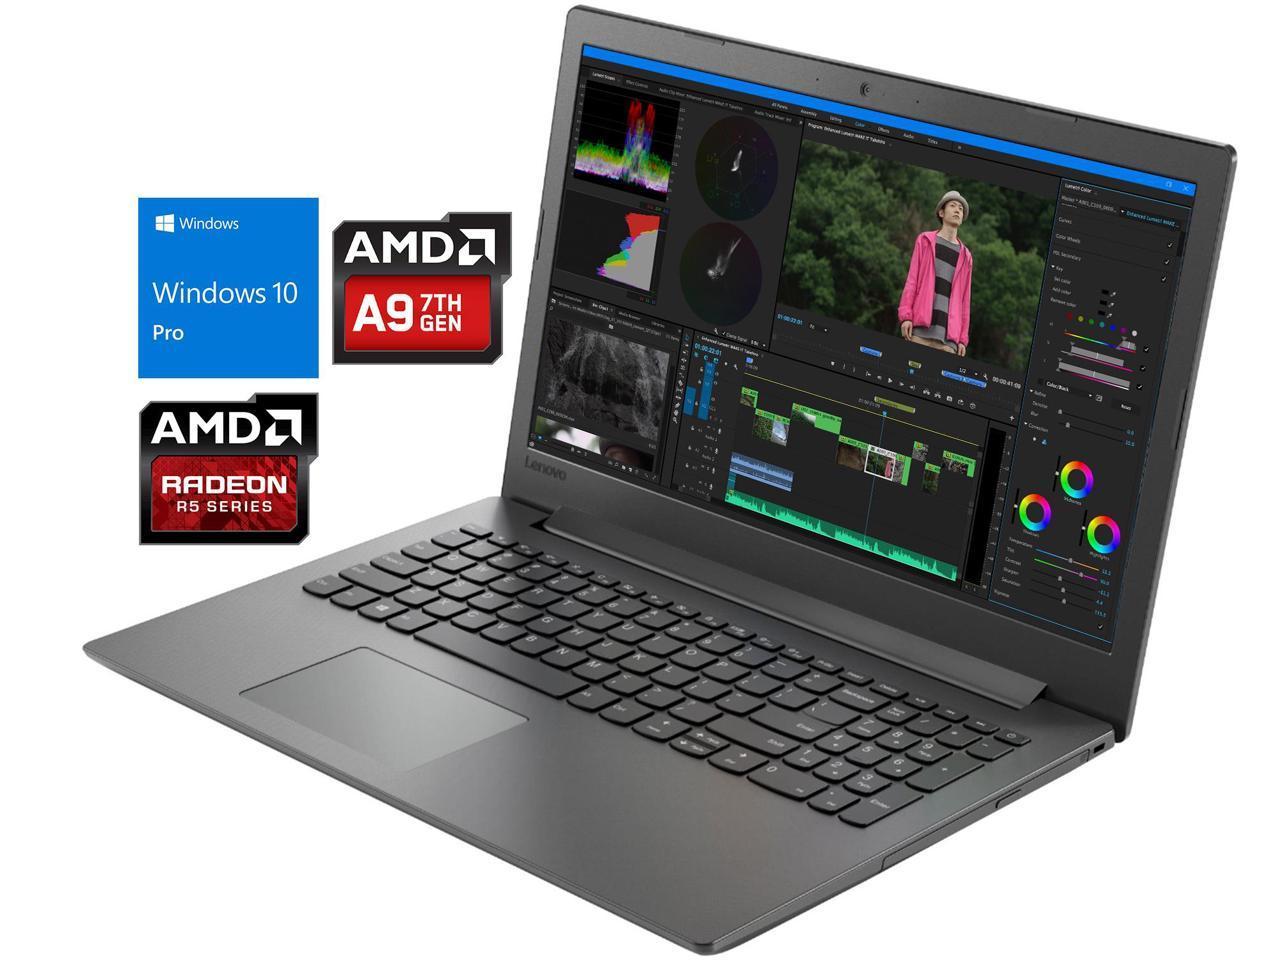 Lenovo Ideapad 130 Laptop 15 6 Hd Display Amd A9 9425 Upto 3 70ghz 4gb Ram 256gb Ssd Dvdrw Hdmi Card Reader Wi Fi Bluetooth Windows 10 Pro Newegg Com